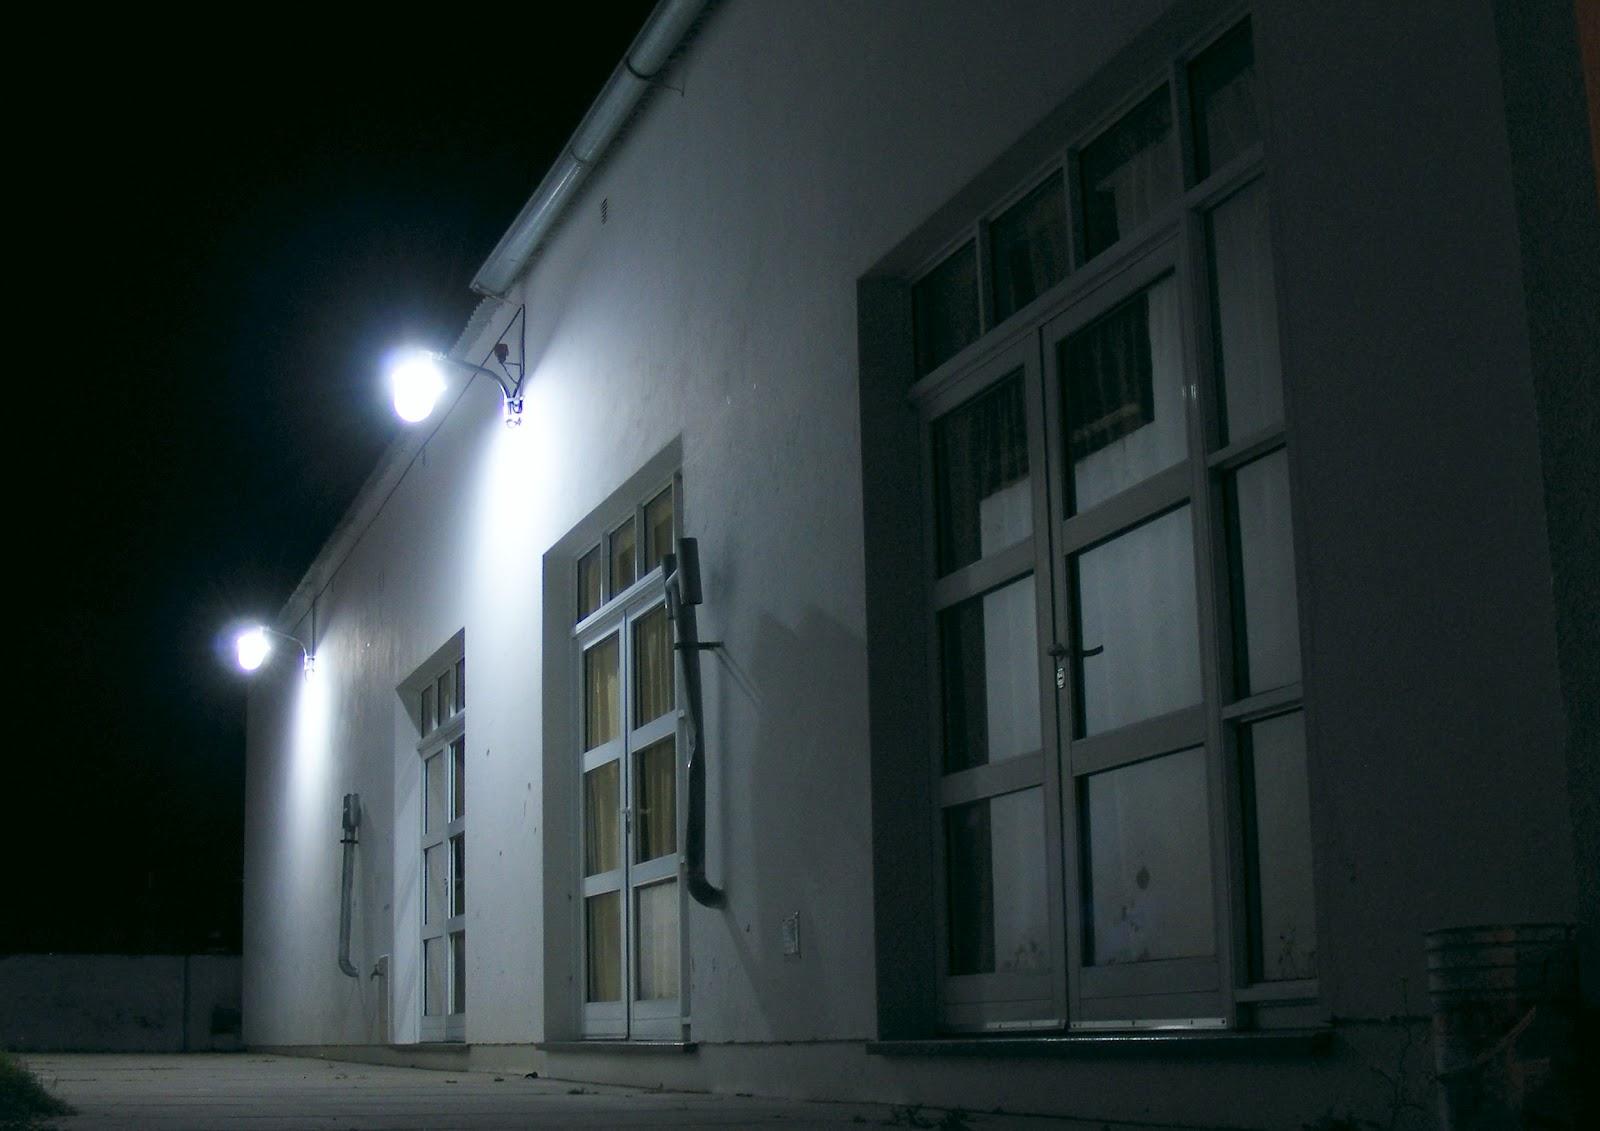 Municipalidad de caleuf iluminaci n del comedor escolar - Iluminacion comedor ...